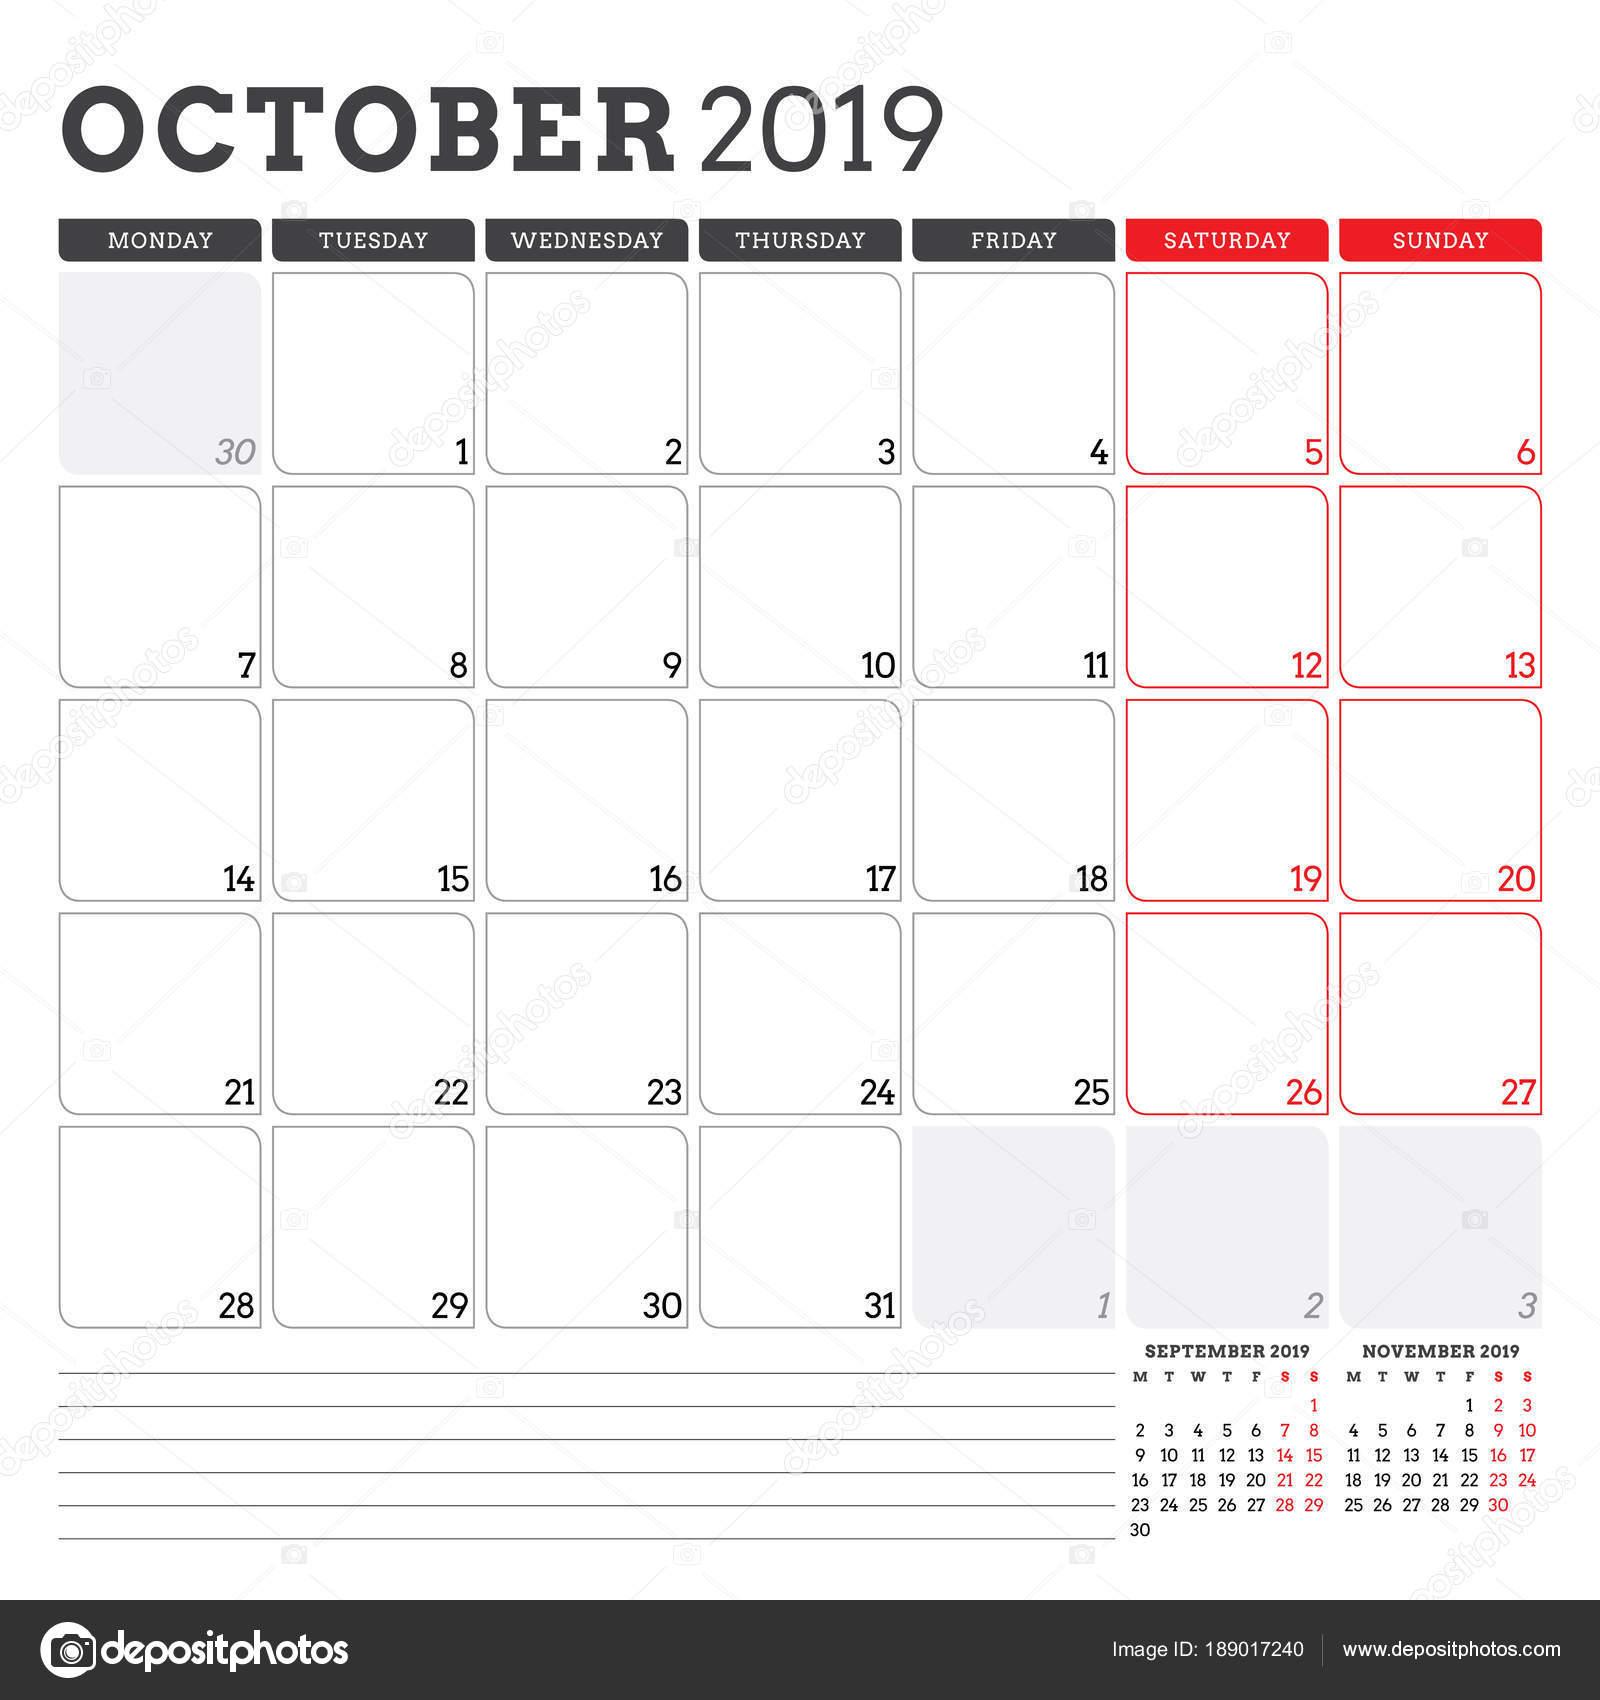 october weekly calendar 2019